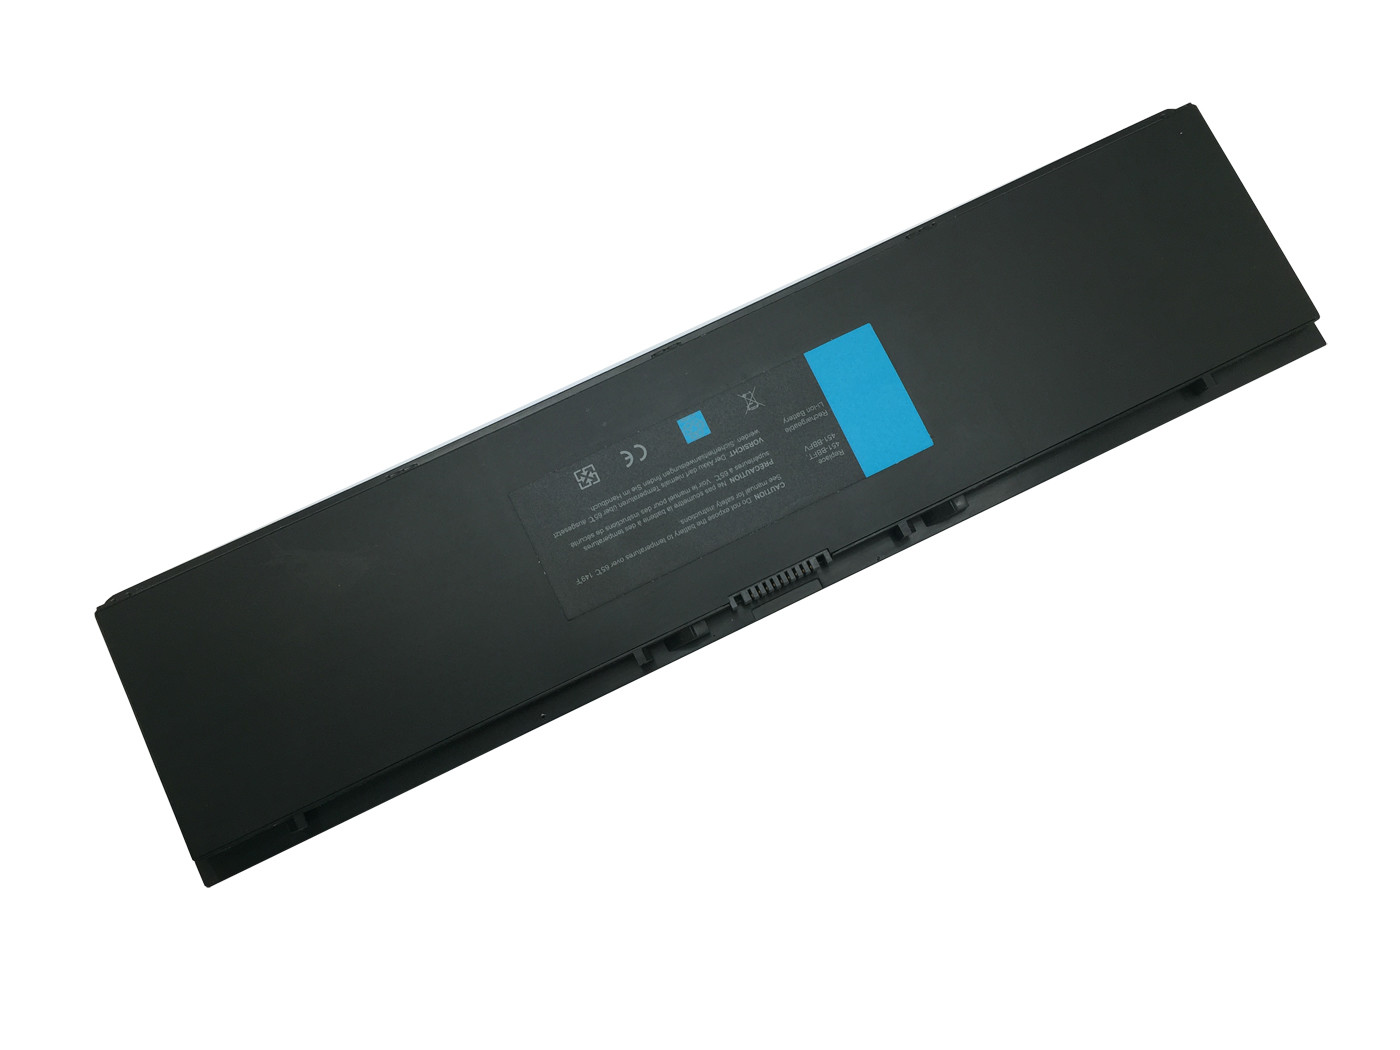 DLH - Batterie pour PC portables DELL Latitude E7440 / Latitude E7450 - 6000mAh-44Wh